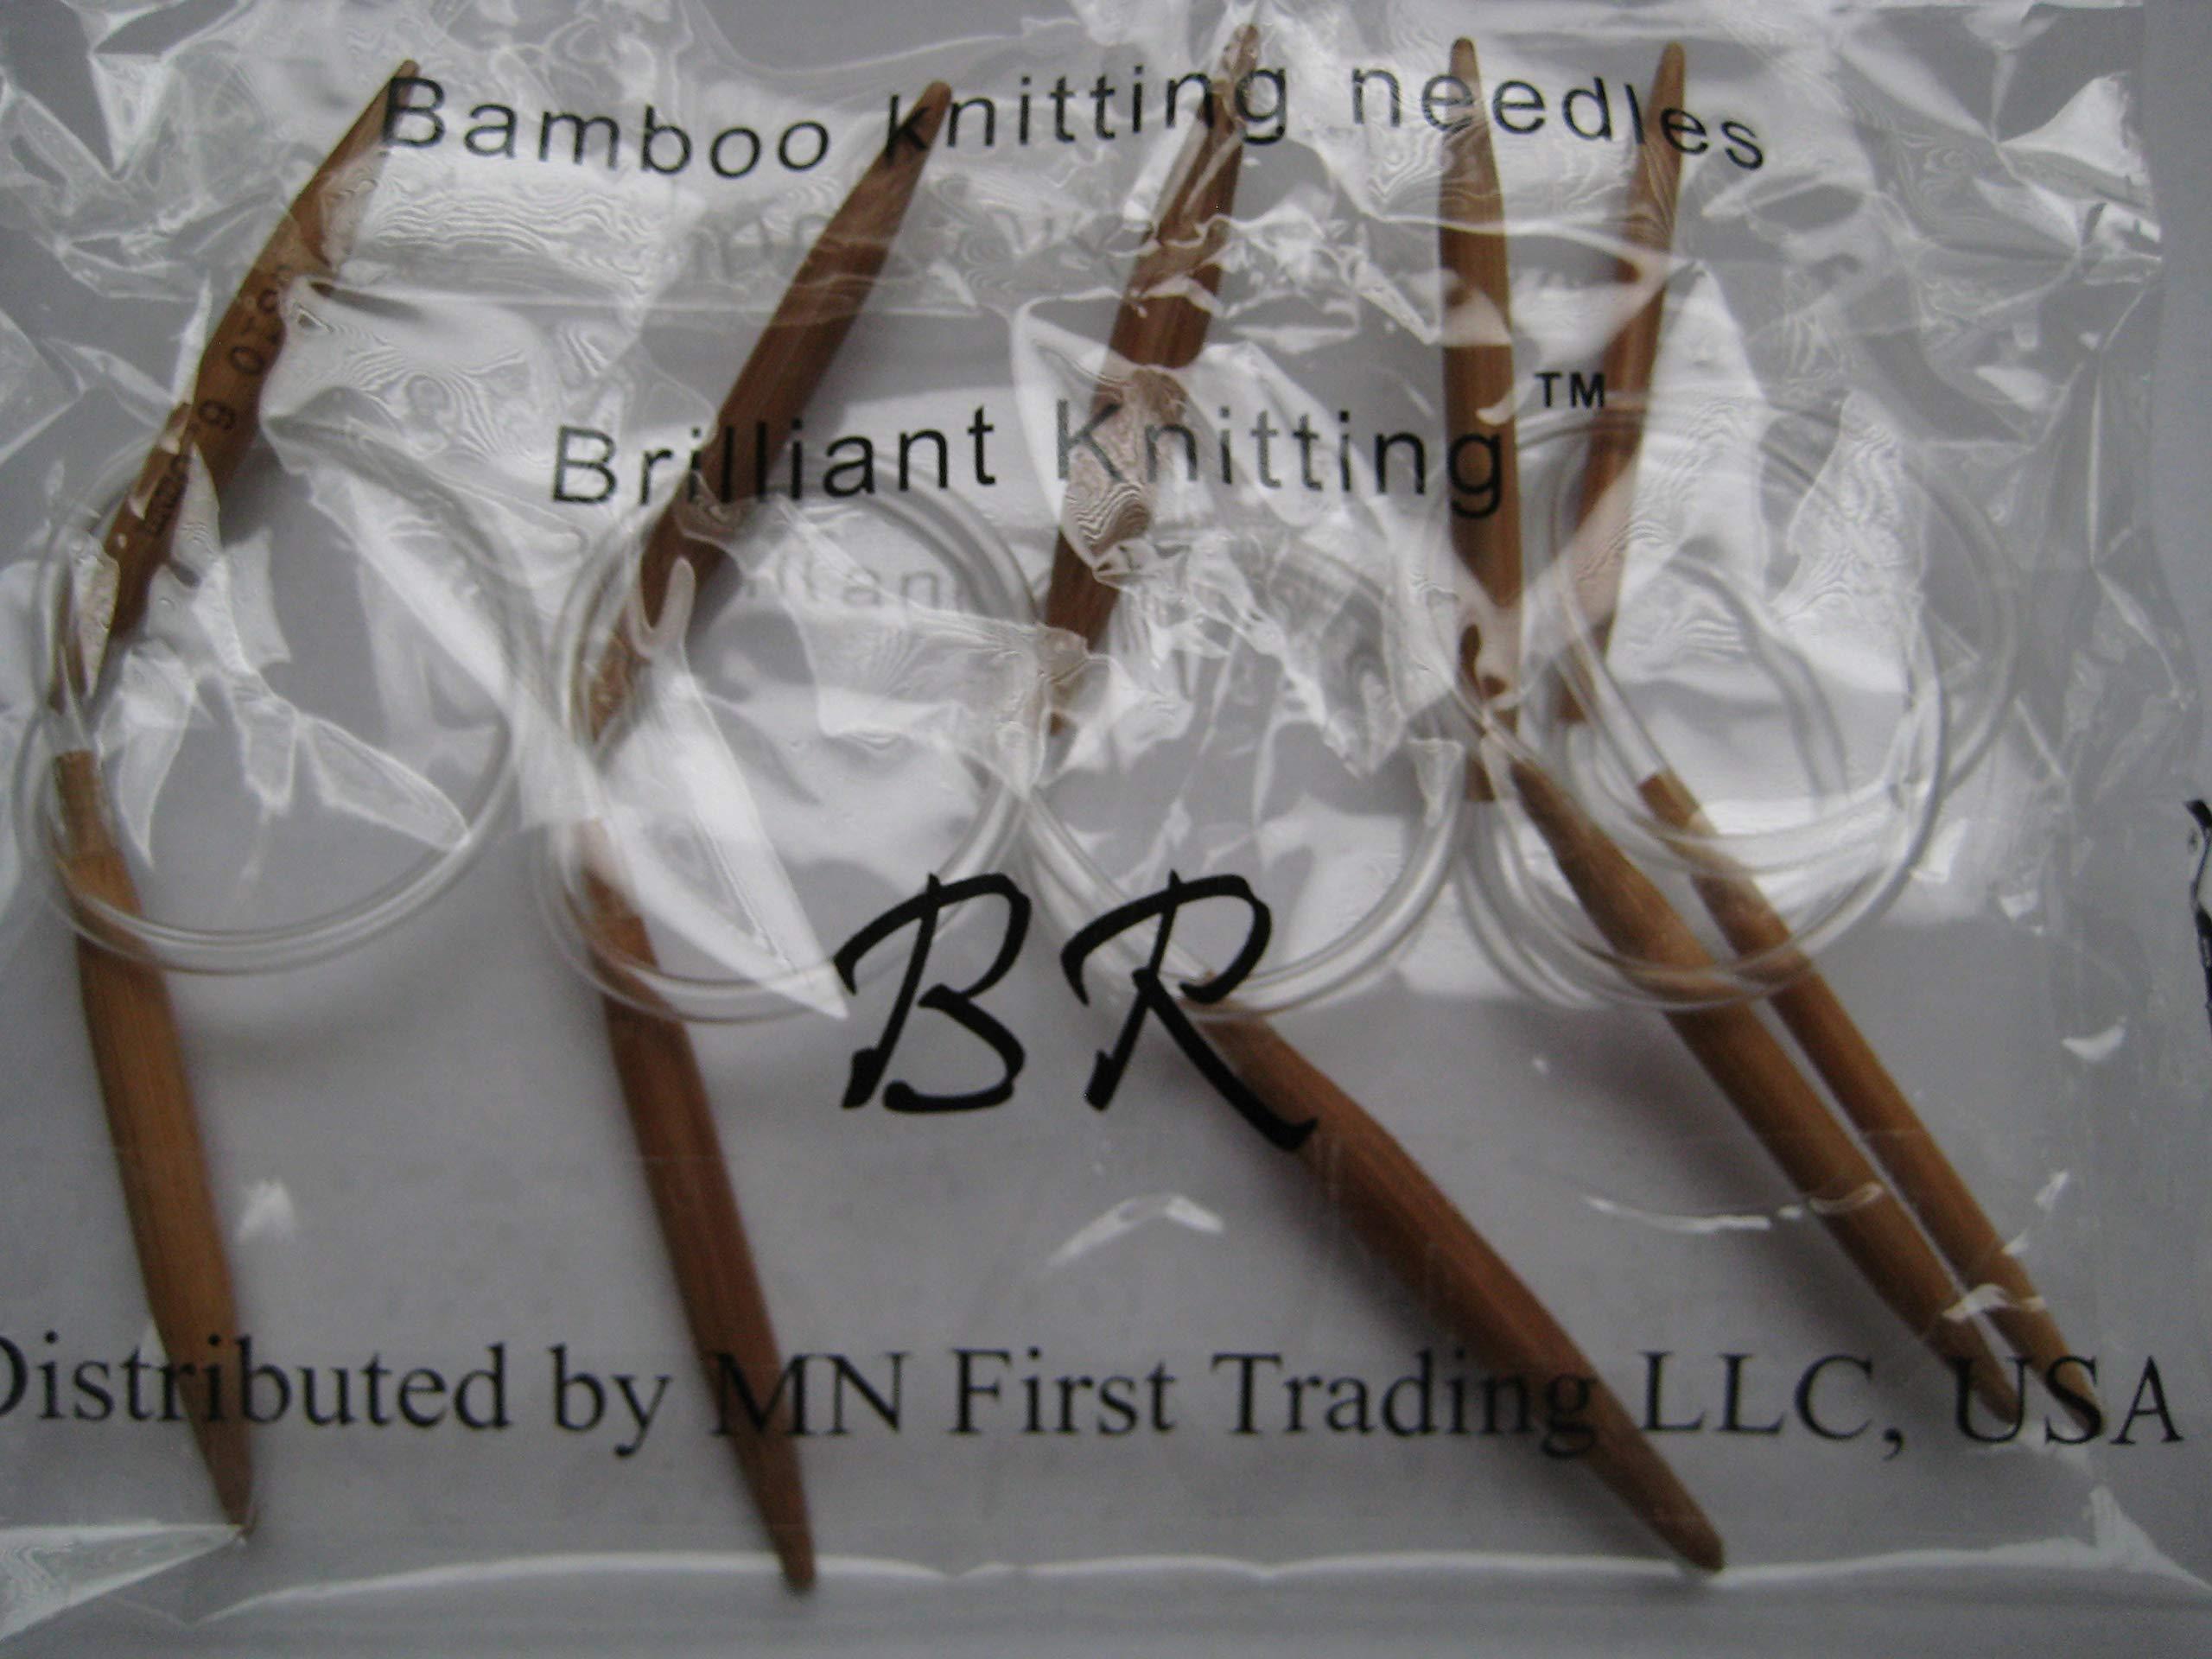 5 Bamboo Circular Knitting Needles Brilliant Knitting (BR brand) (US6, 7, 8, 9 and 10) Length 12'' inches, New US-Made tubing, Never Broken Again!